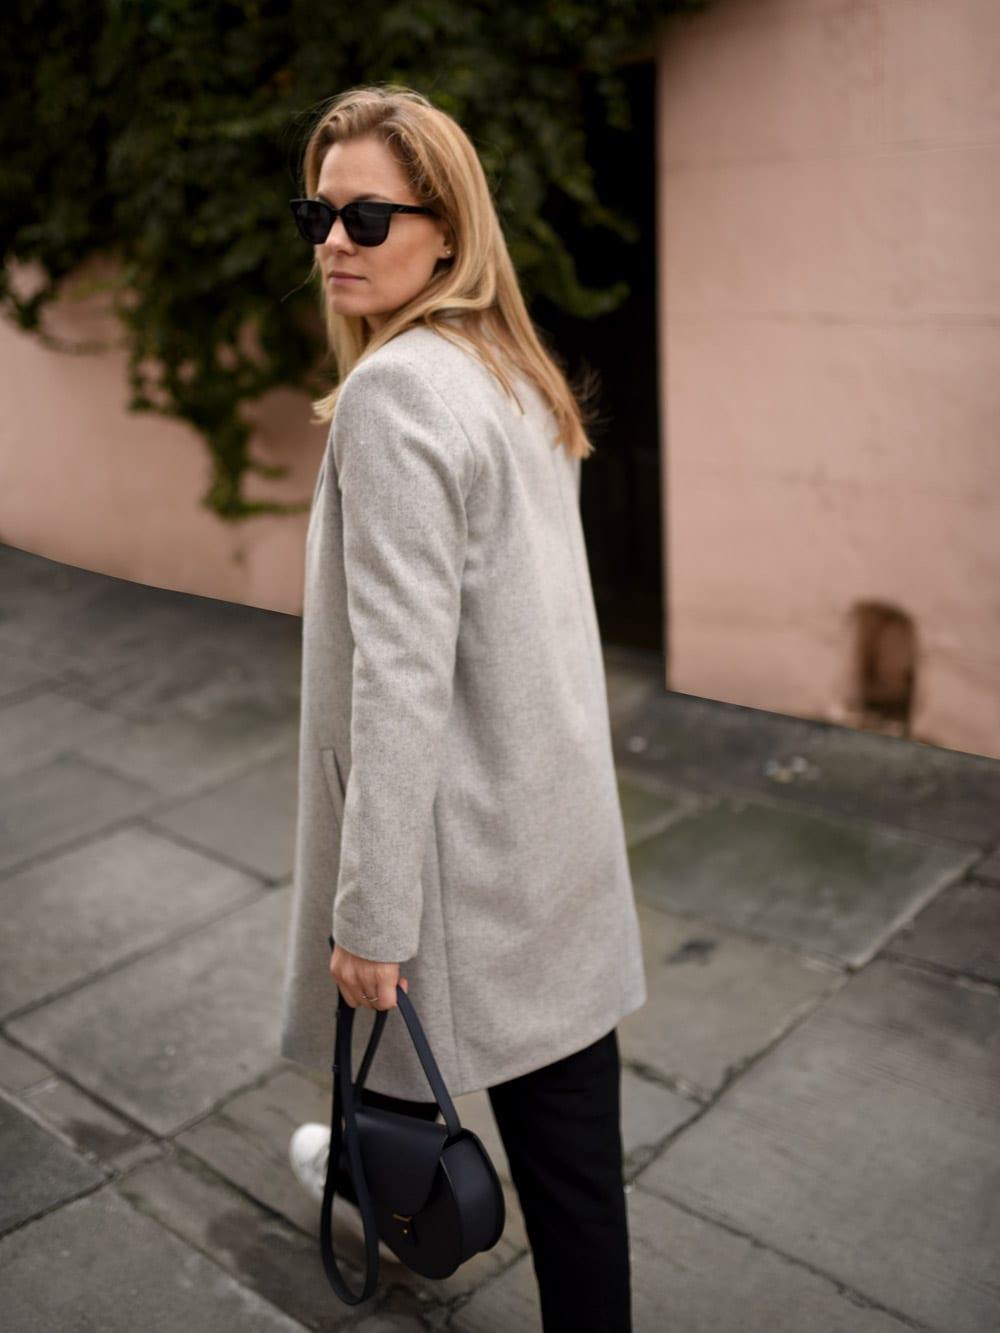 Style&Minimalism | It's Personal | Pink Walls & Grey Coats | Wearing Samsøe & Samsøe, PB0110, Alexander Wang, Lemaire x UNIQLO